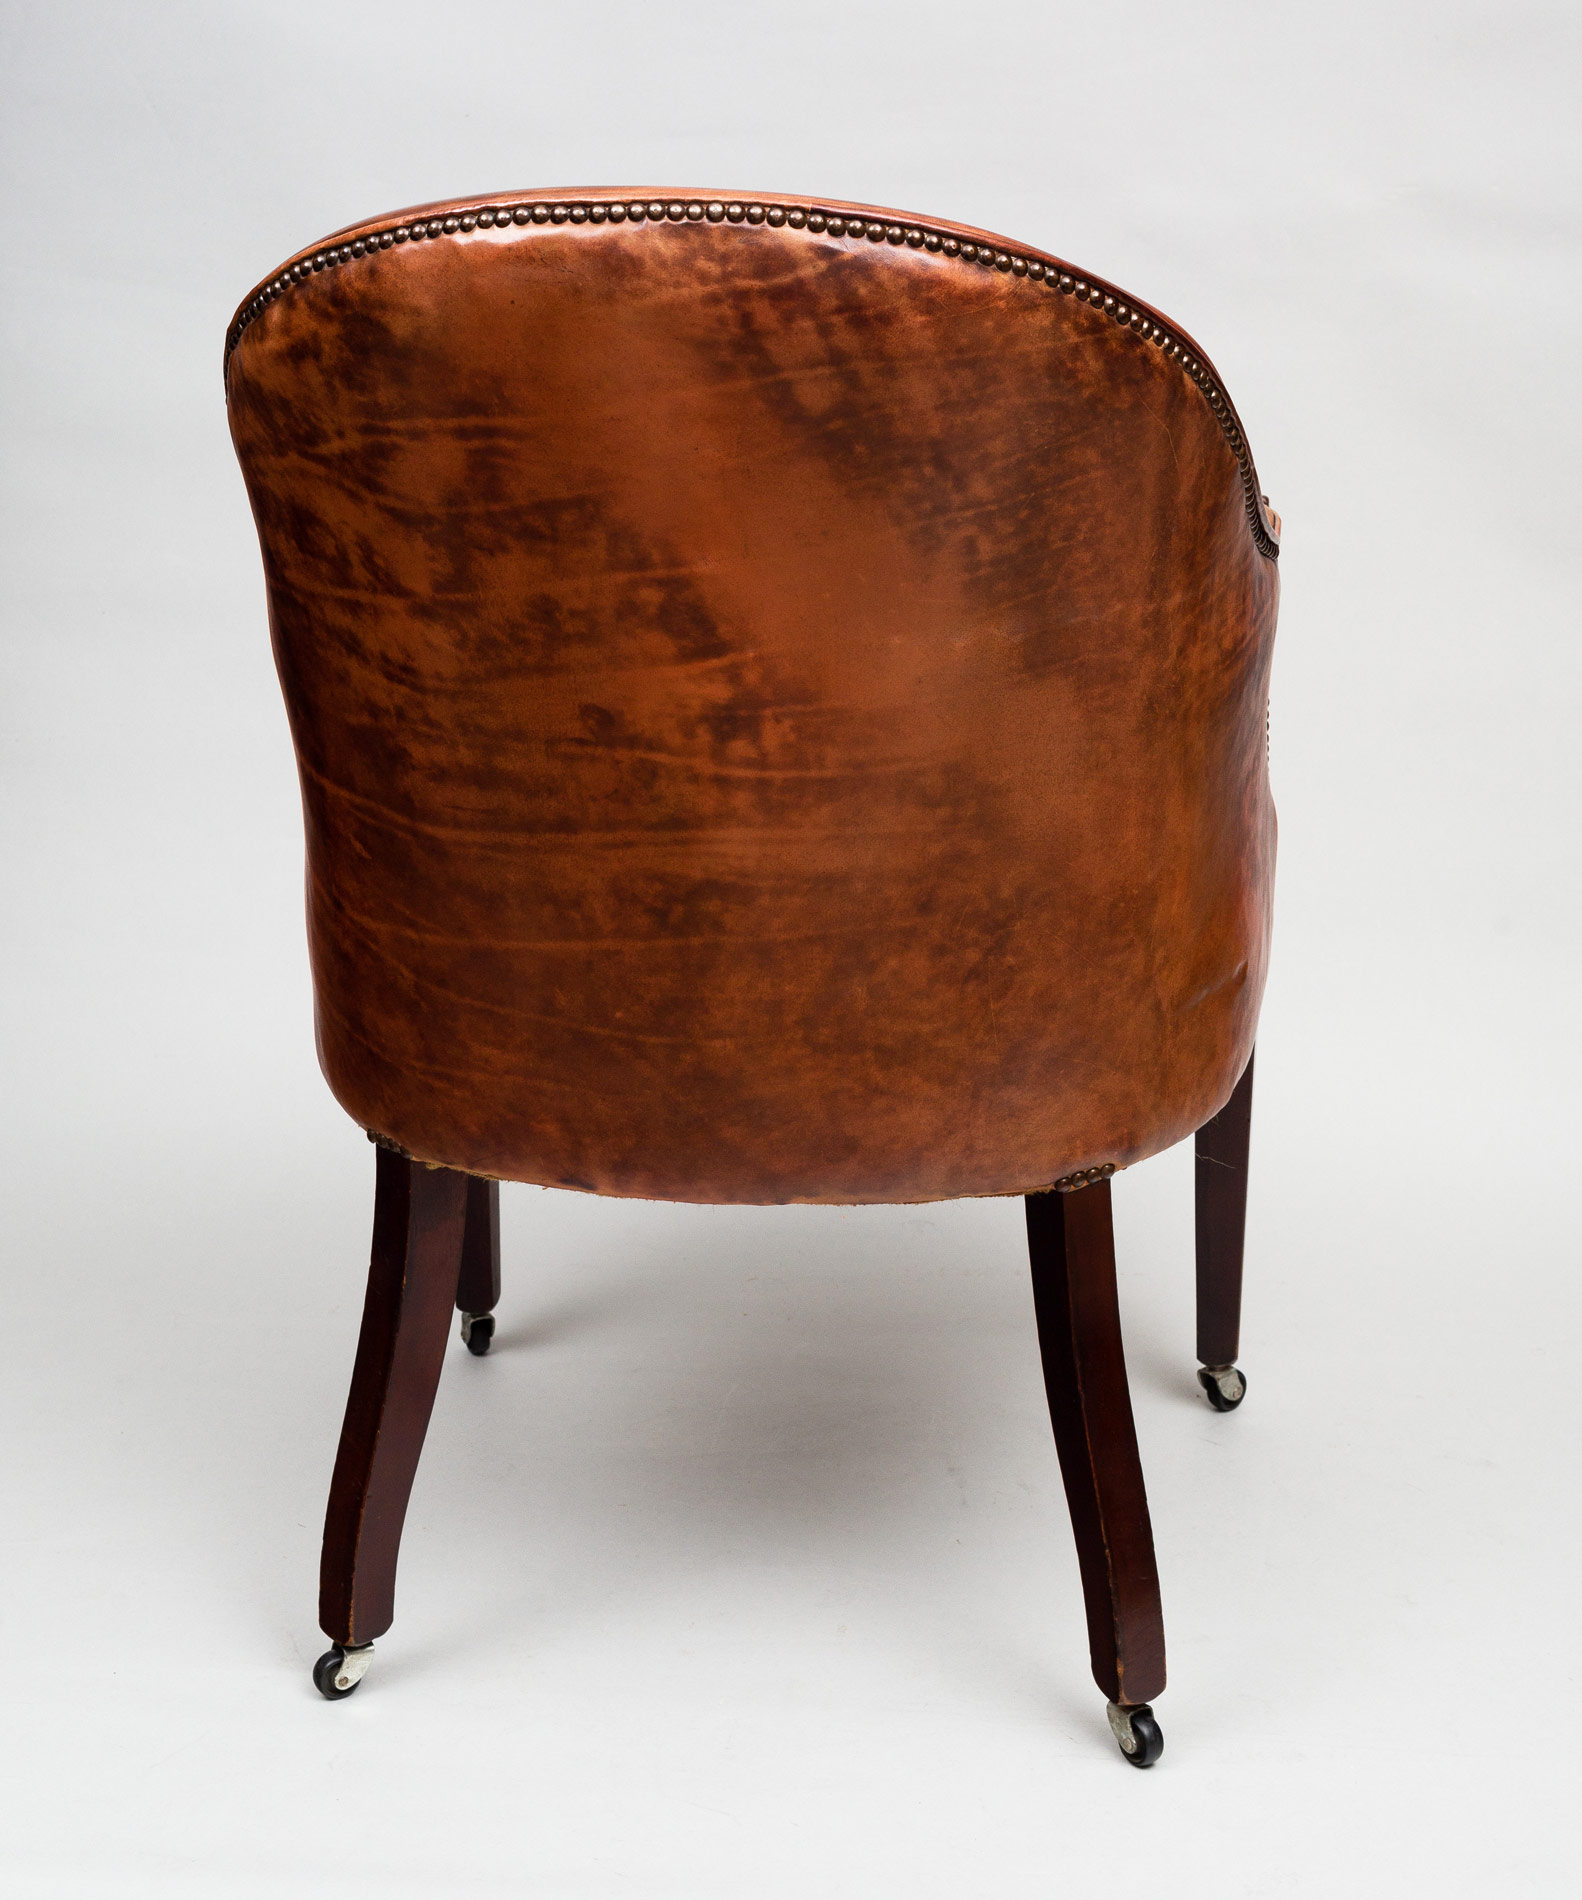 Antique Edwardian Tub Chair | Antique Mahogany Leather Tub Chair